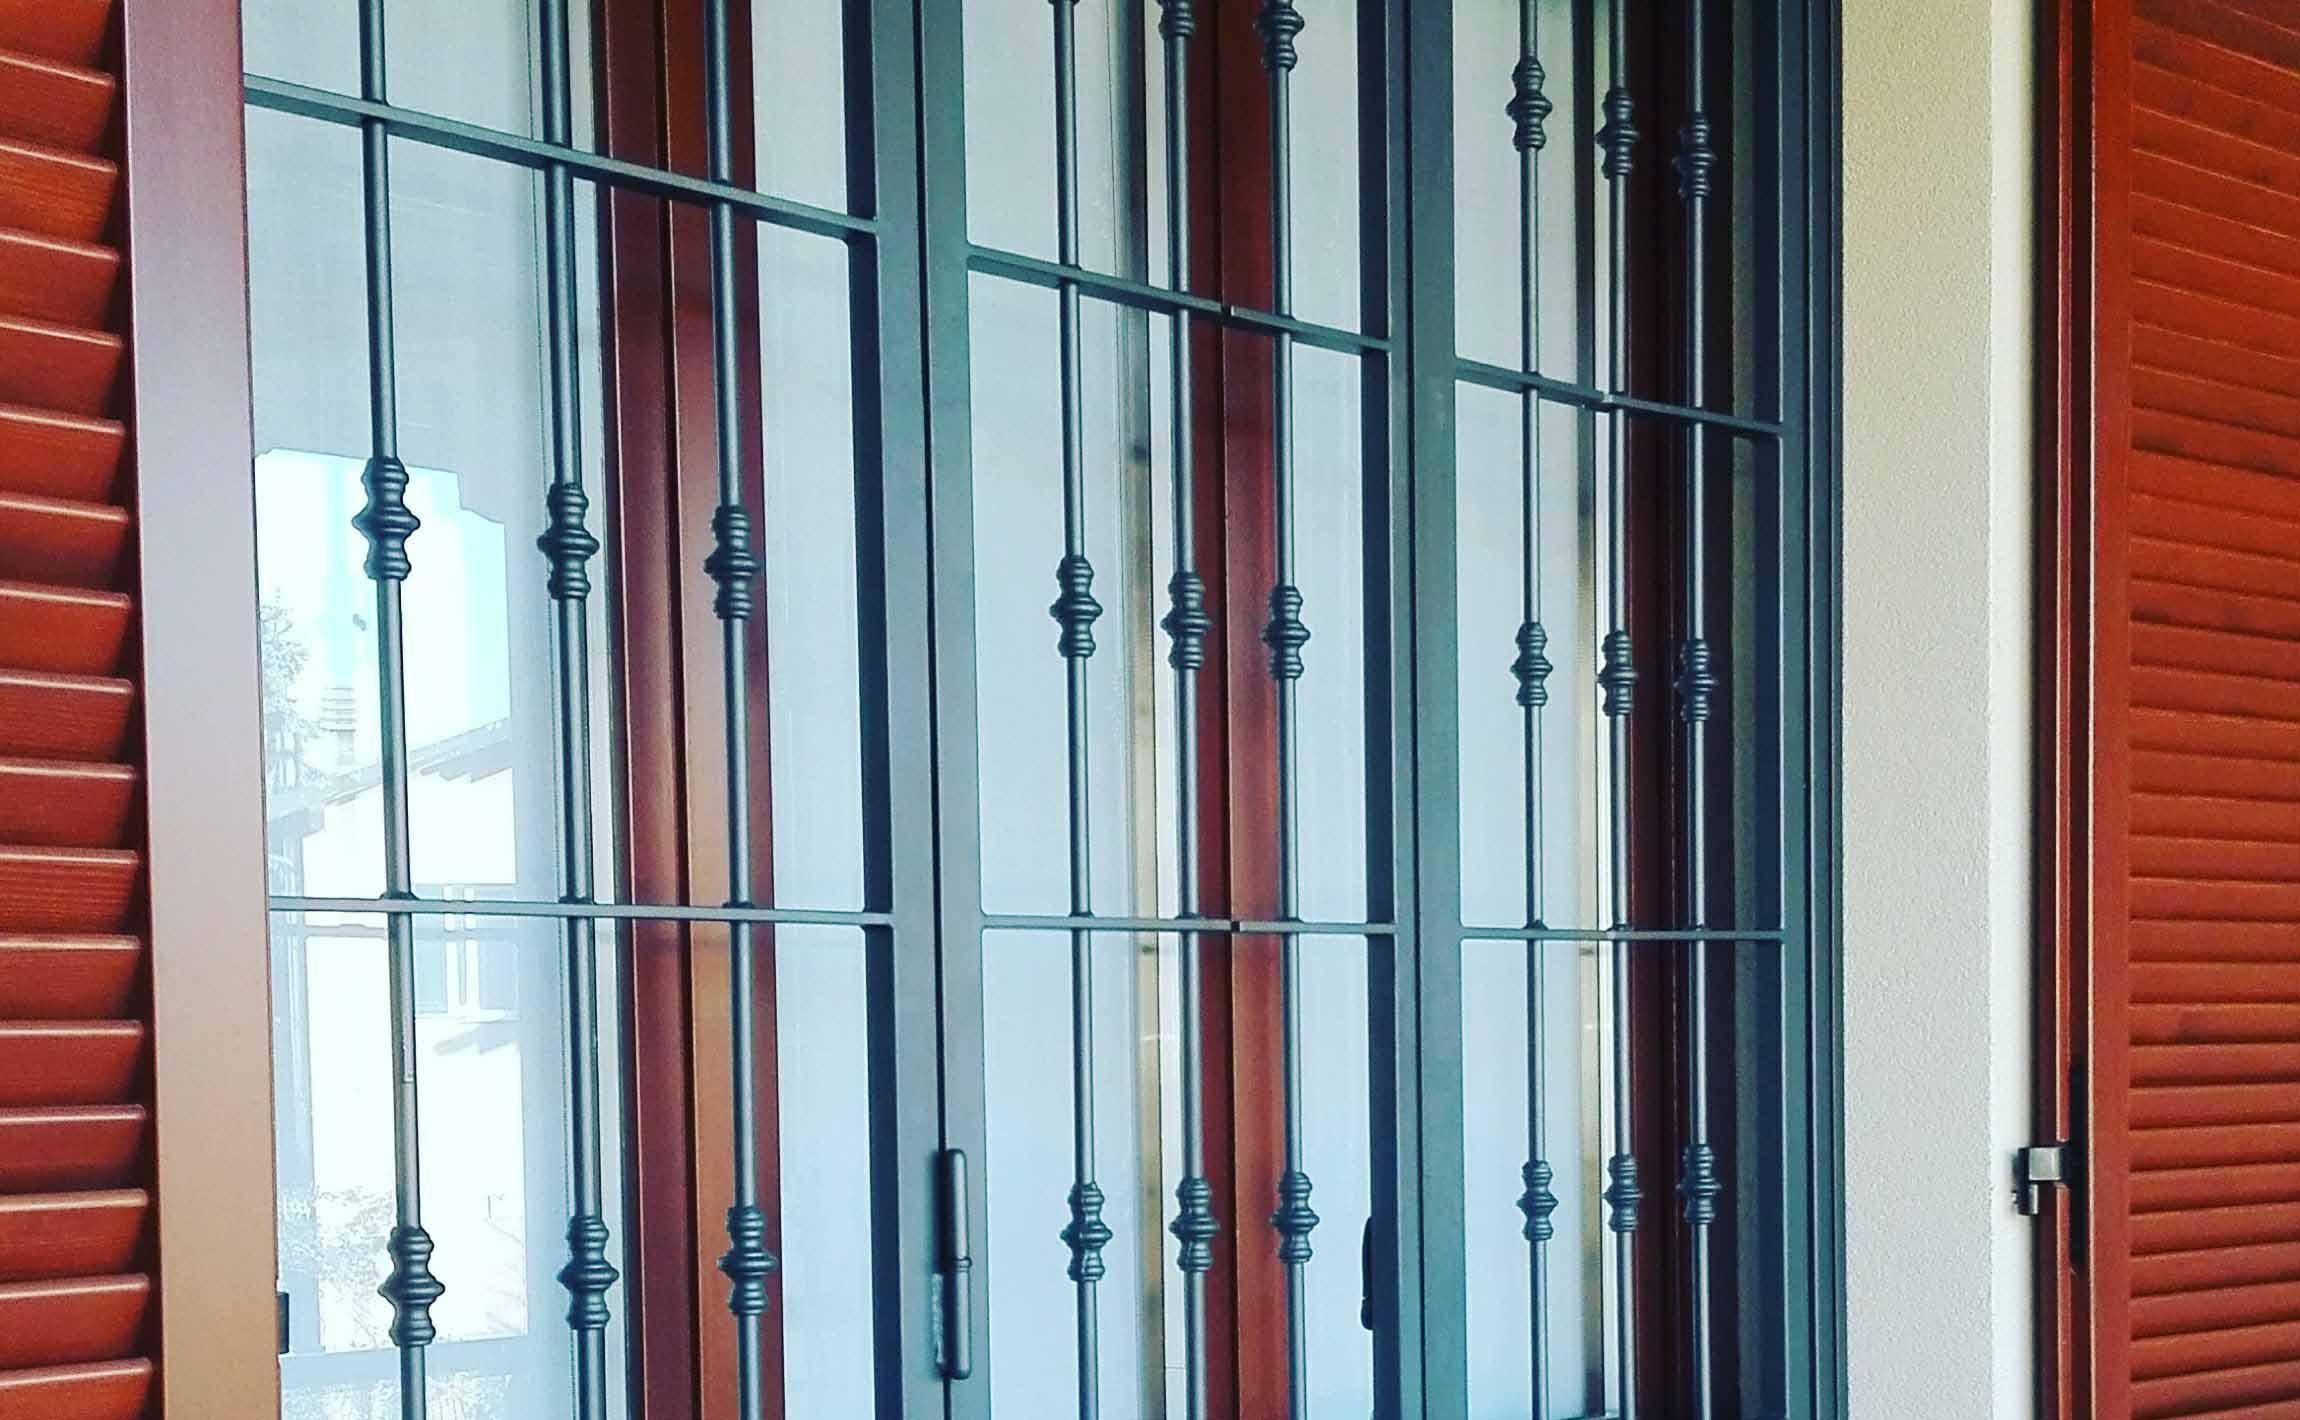 Inferriate e grate di sicurezza slcm srl produzione - Inferriate per finestre detrazioni fiscali ...